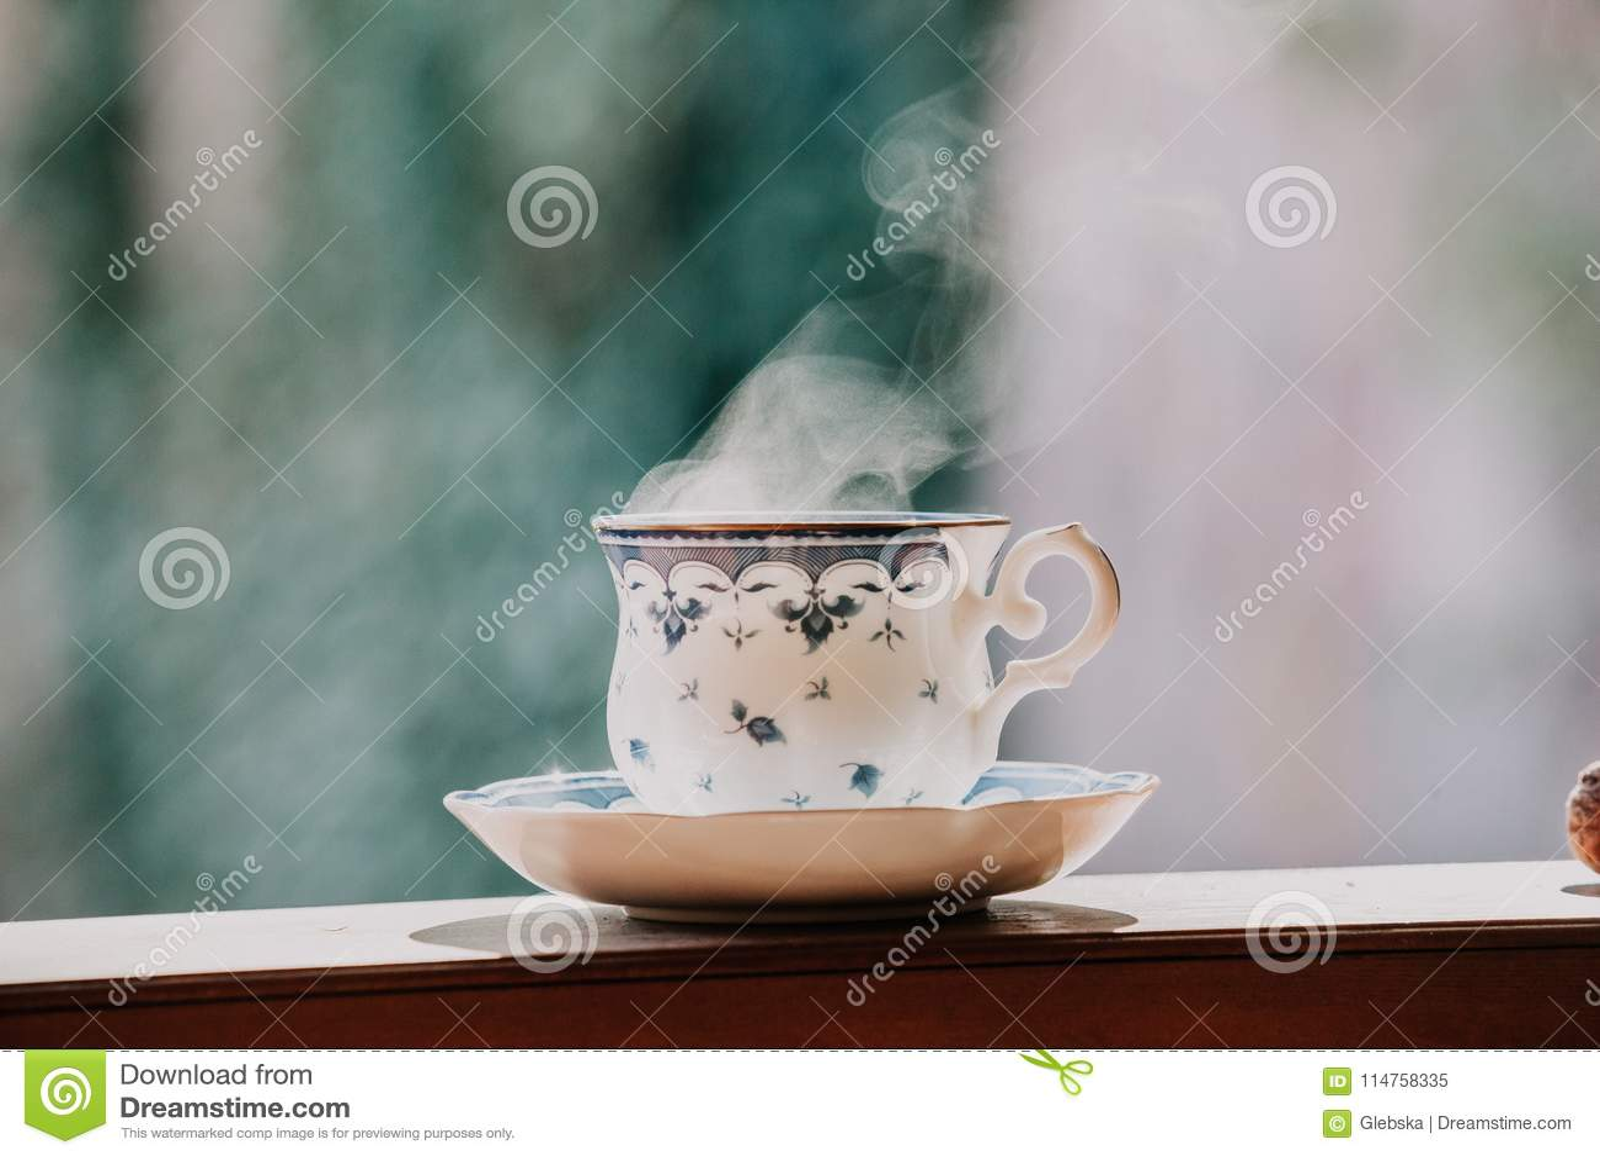 Elegant Tea Cup And Stand Shelf Stock Image Image Of English Wood